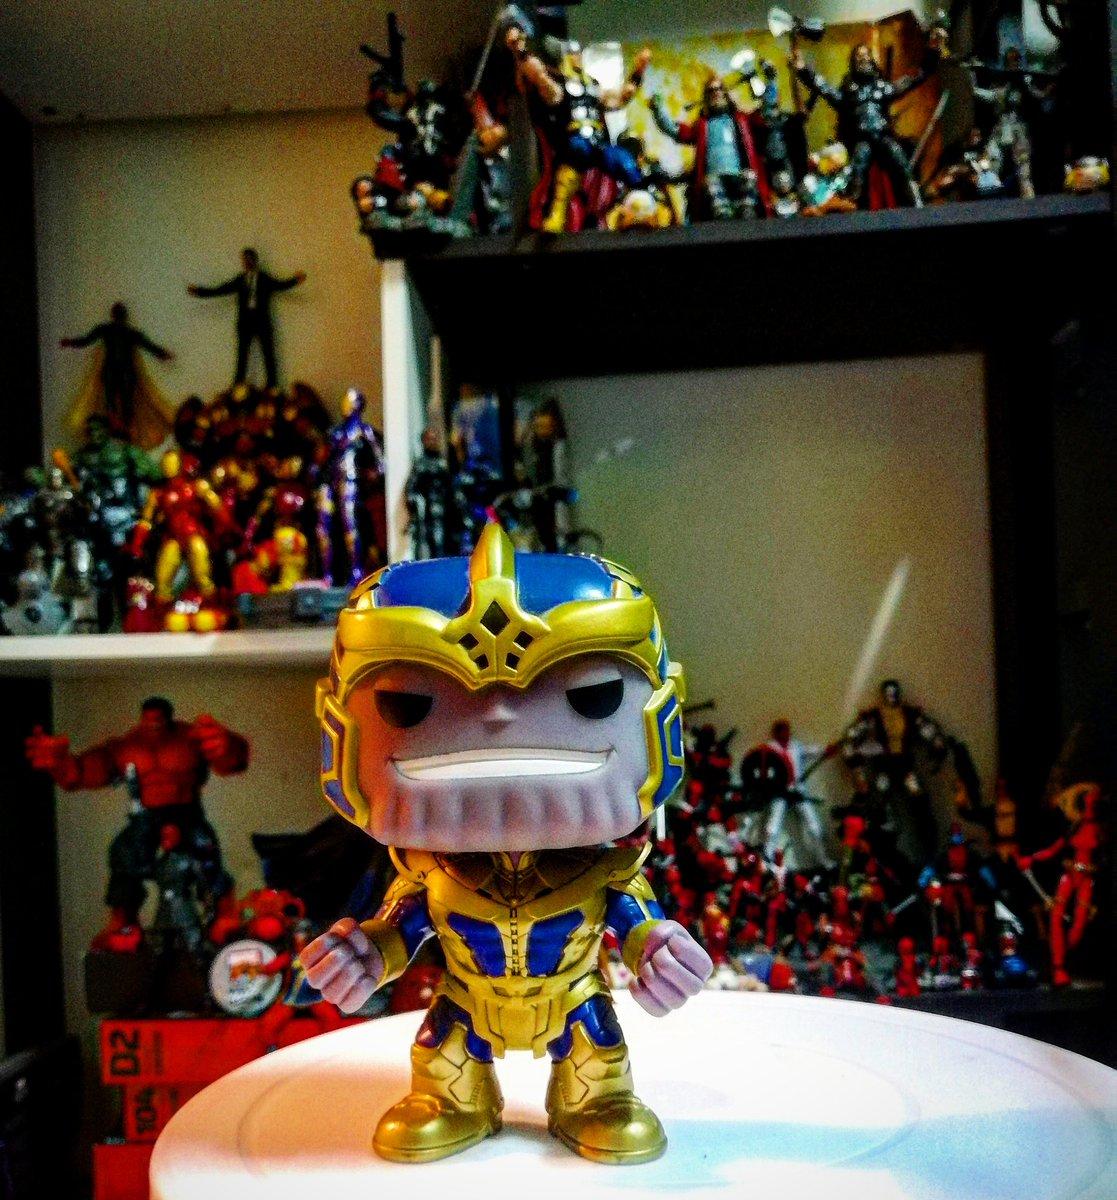 Soldout 🖤 #thanos #funkopop #marvel  #infinitywar #endgame #mycollection #mamcollection #ironman #avengers #captainamerica #xmen #thor #ครั้งหนึ่งเคยมี #blackwidow #warmachine #tonystark #hulk #vision #hulkbuster #doctorstrange #deadpool #spiderman #marvellegends #cosbaby https://t.co/c1FMeIZBy7